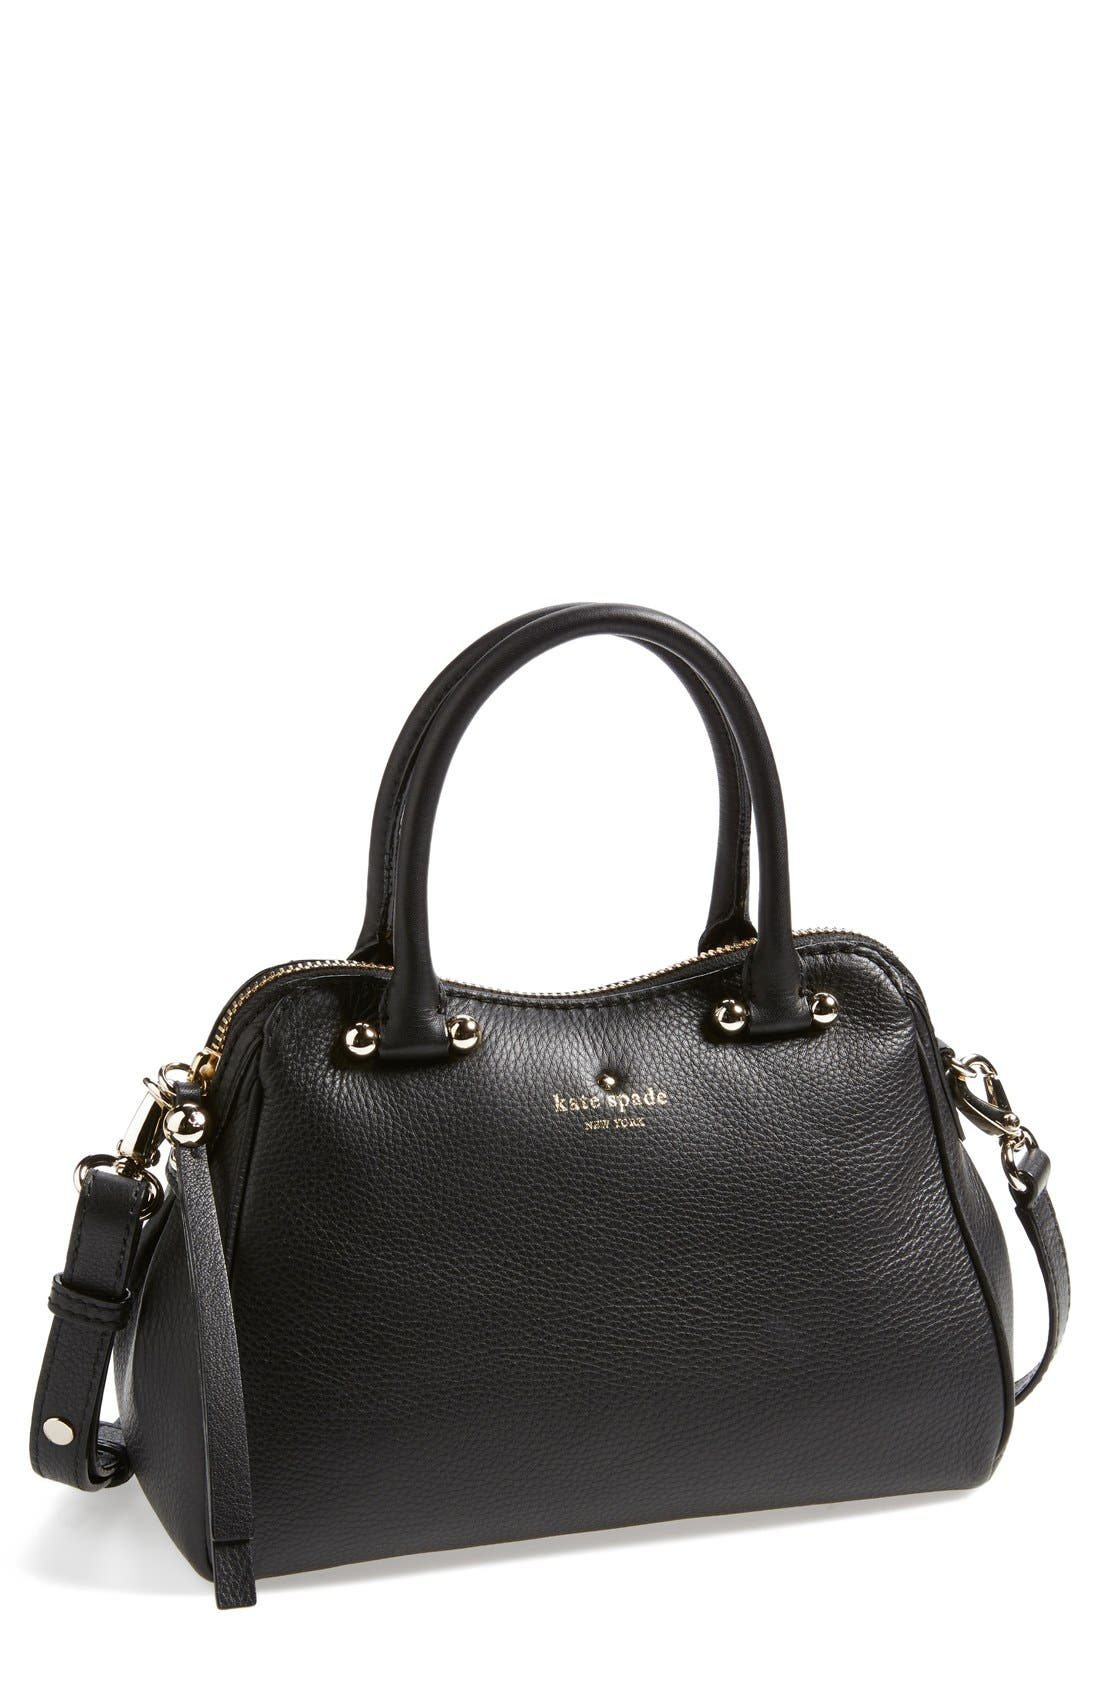 Main Image - kate spade new york 'charles street - mini audrey' leather satchel